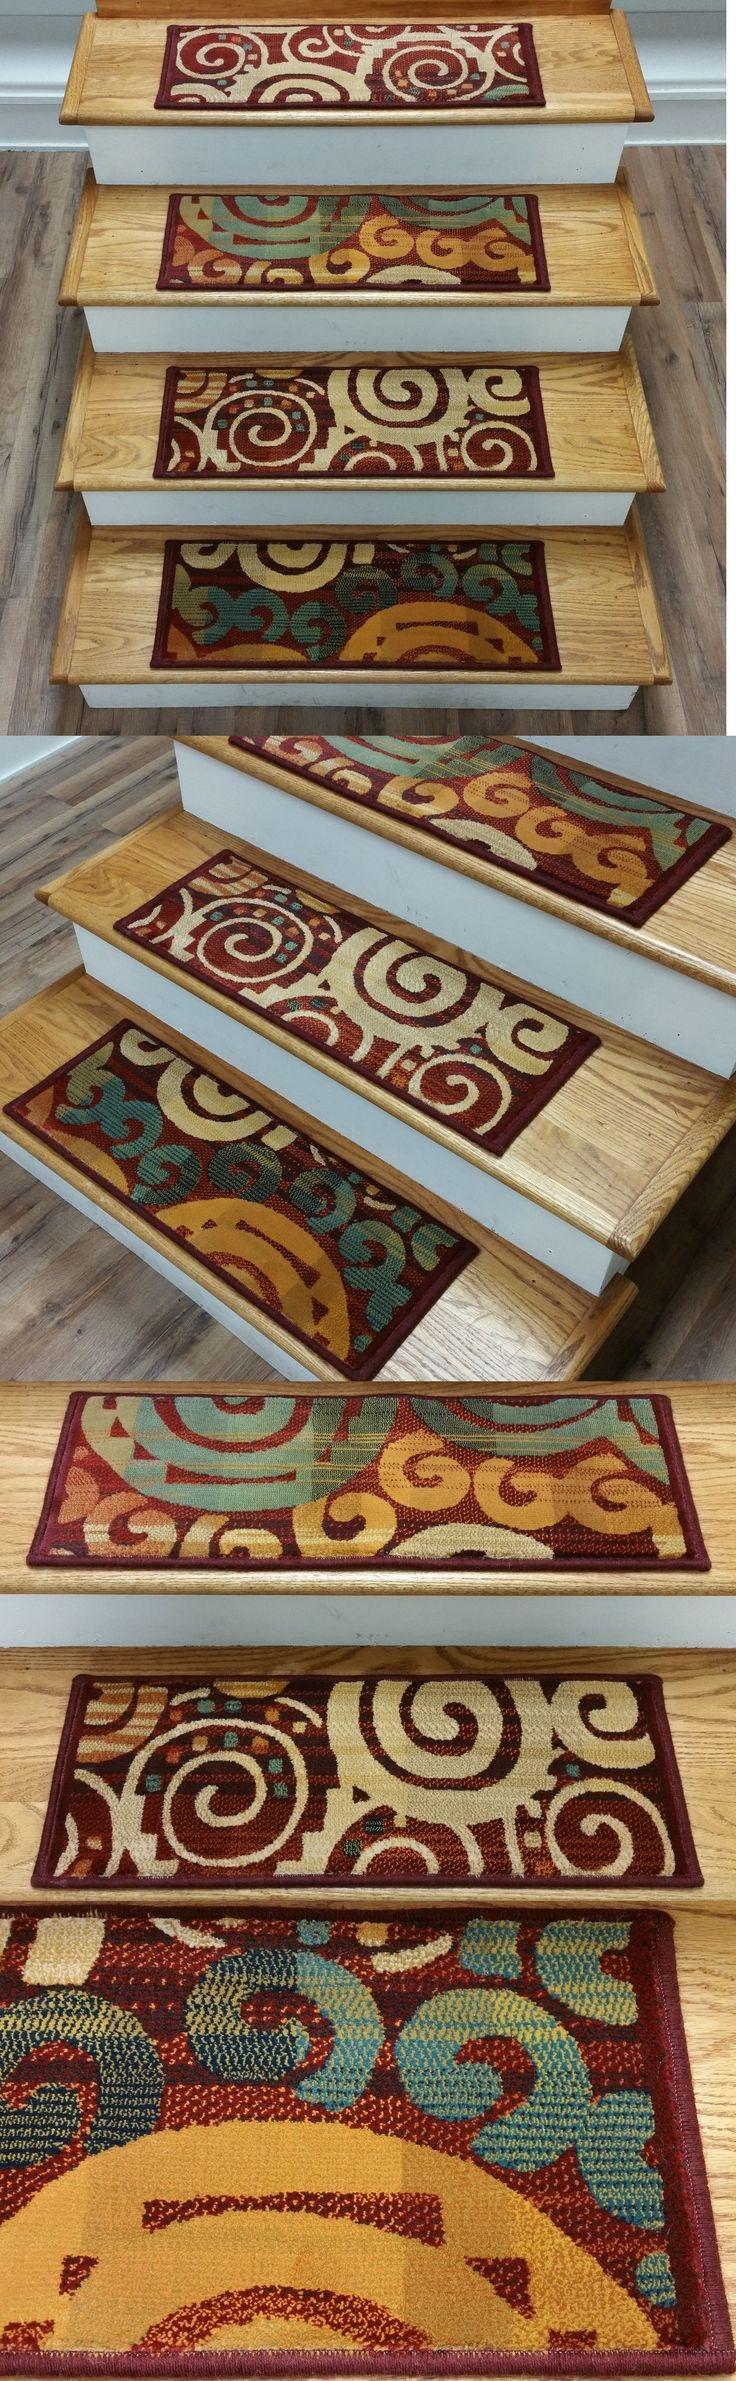 Best 20 Stair Tread Rugs Ideas On Pinterest Carpet Stair Treads Intended For Carpet Stair Treads And Rugs 9× (View 17 of 20)